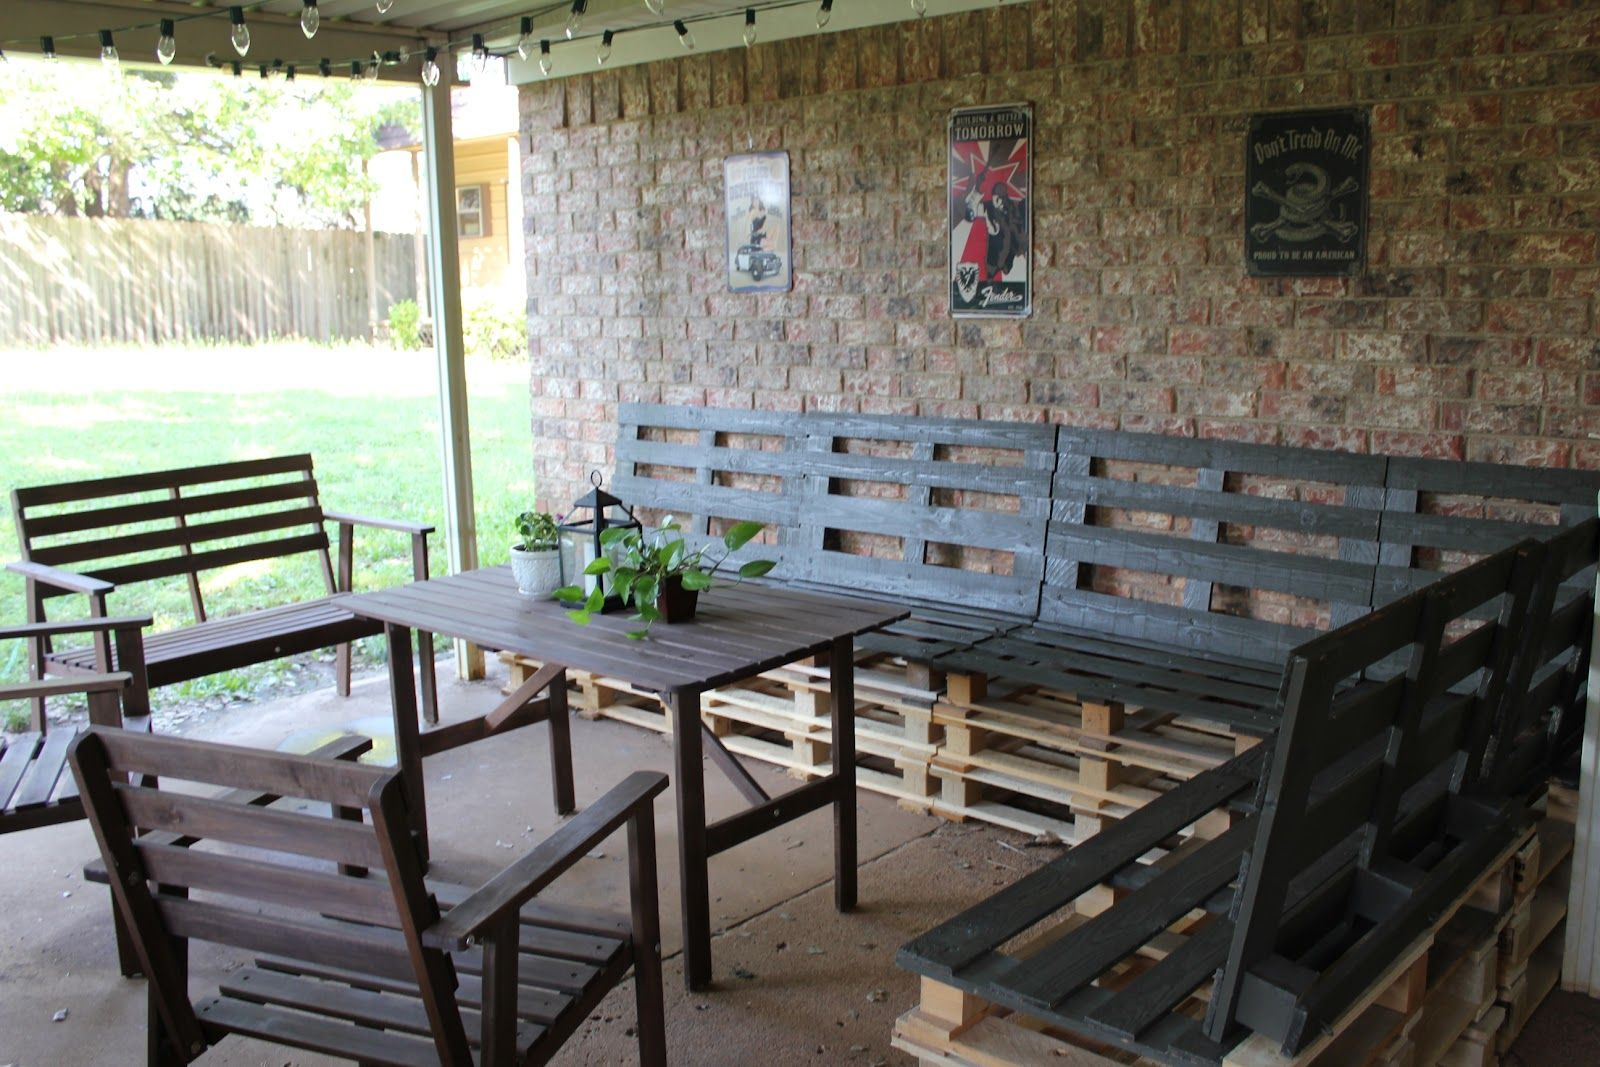 Juego de Terraza Café | Muebles con Palets | Pinterest | Juego de ...